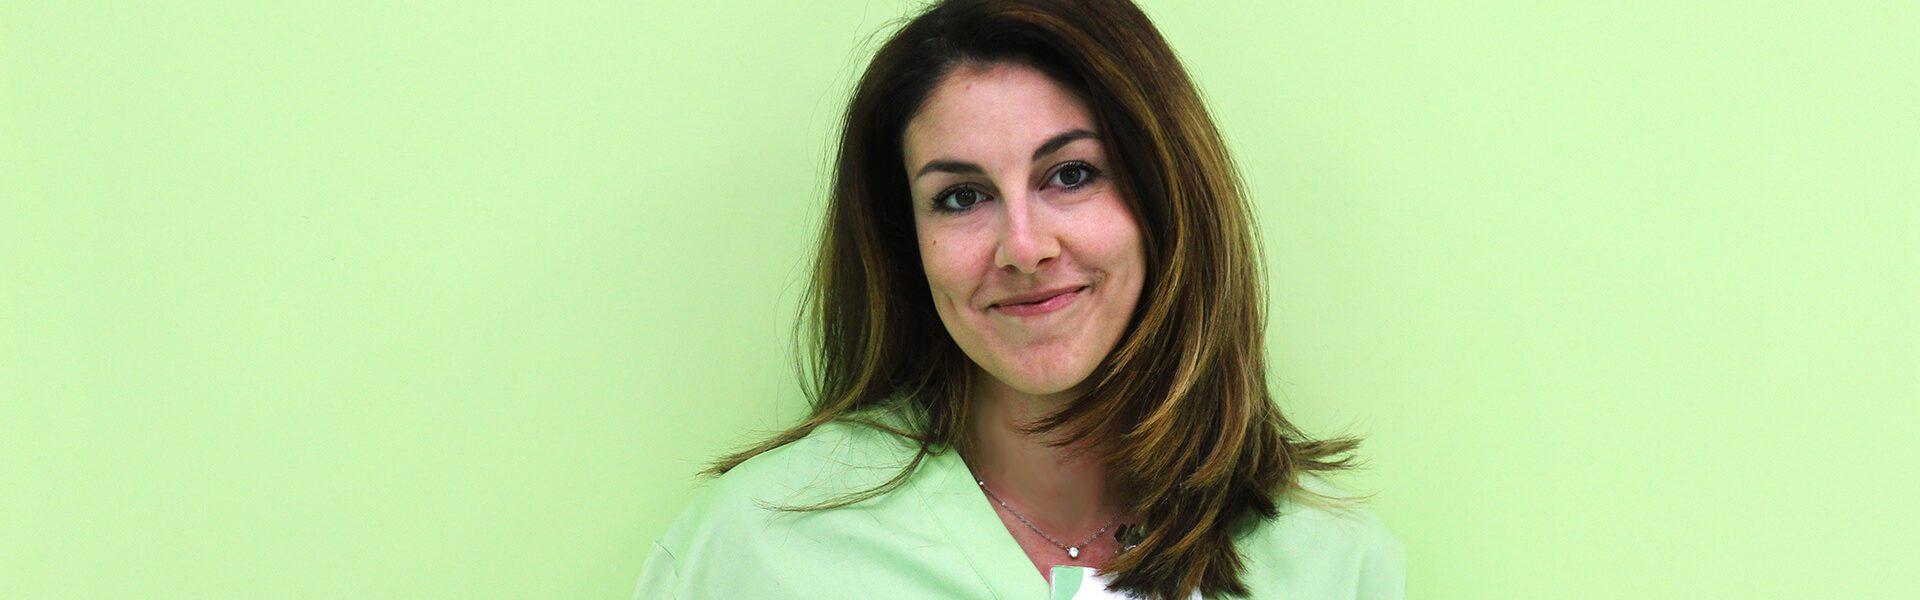 Eleonora Fiore Neuropsicomotricista